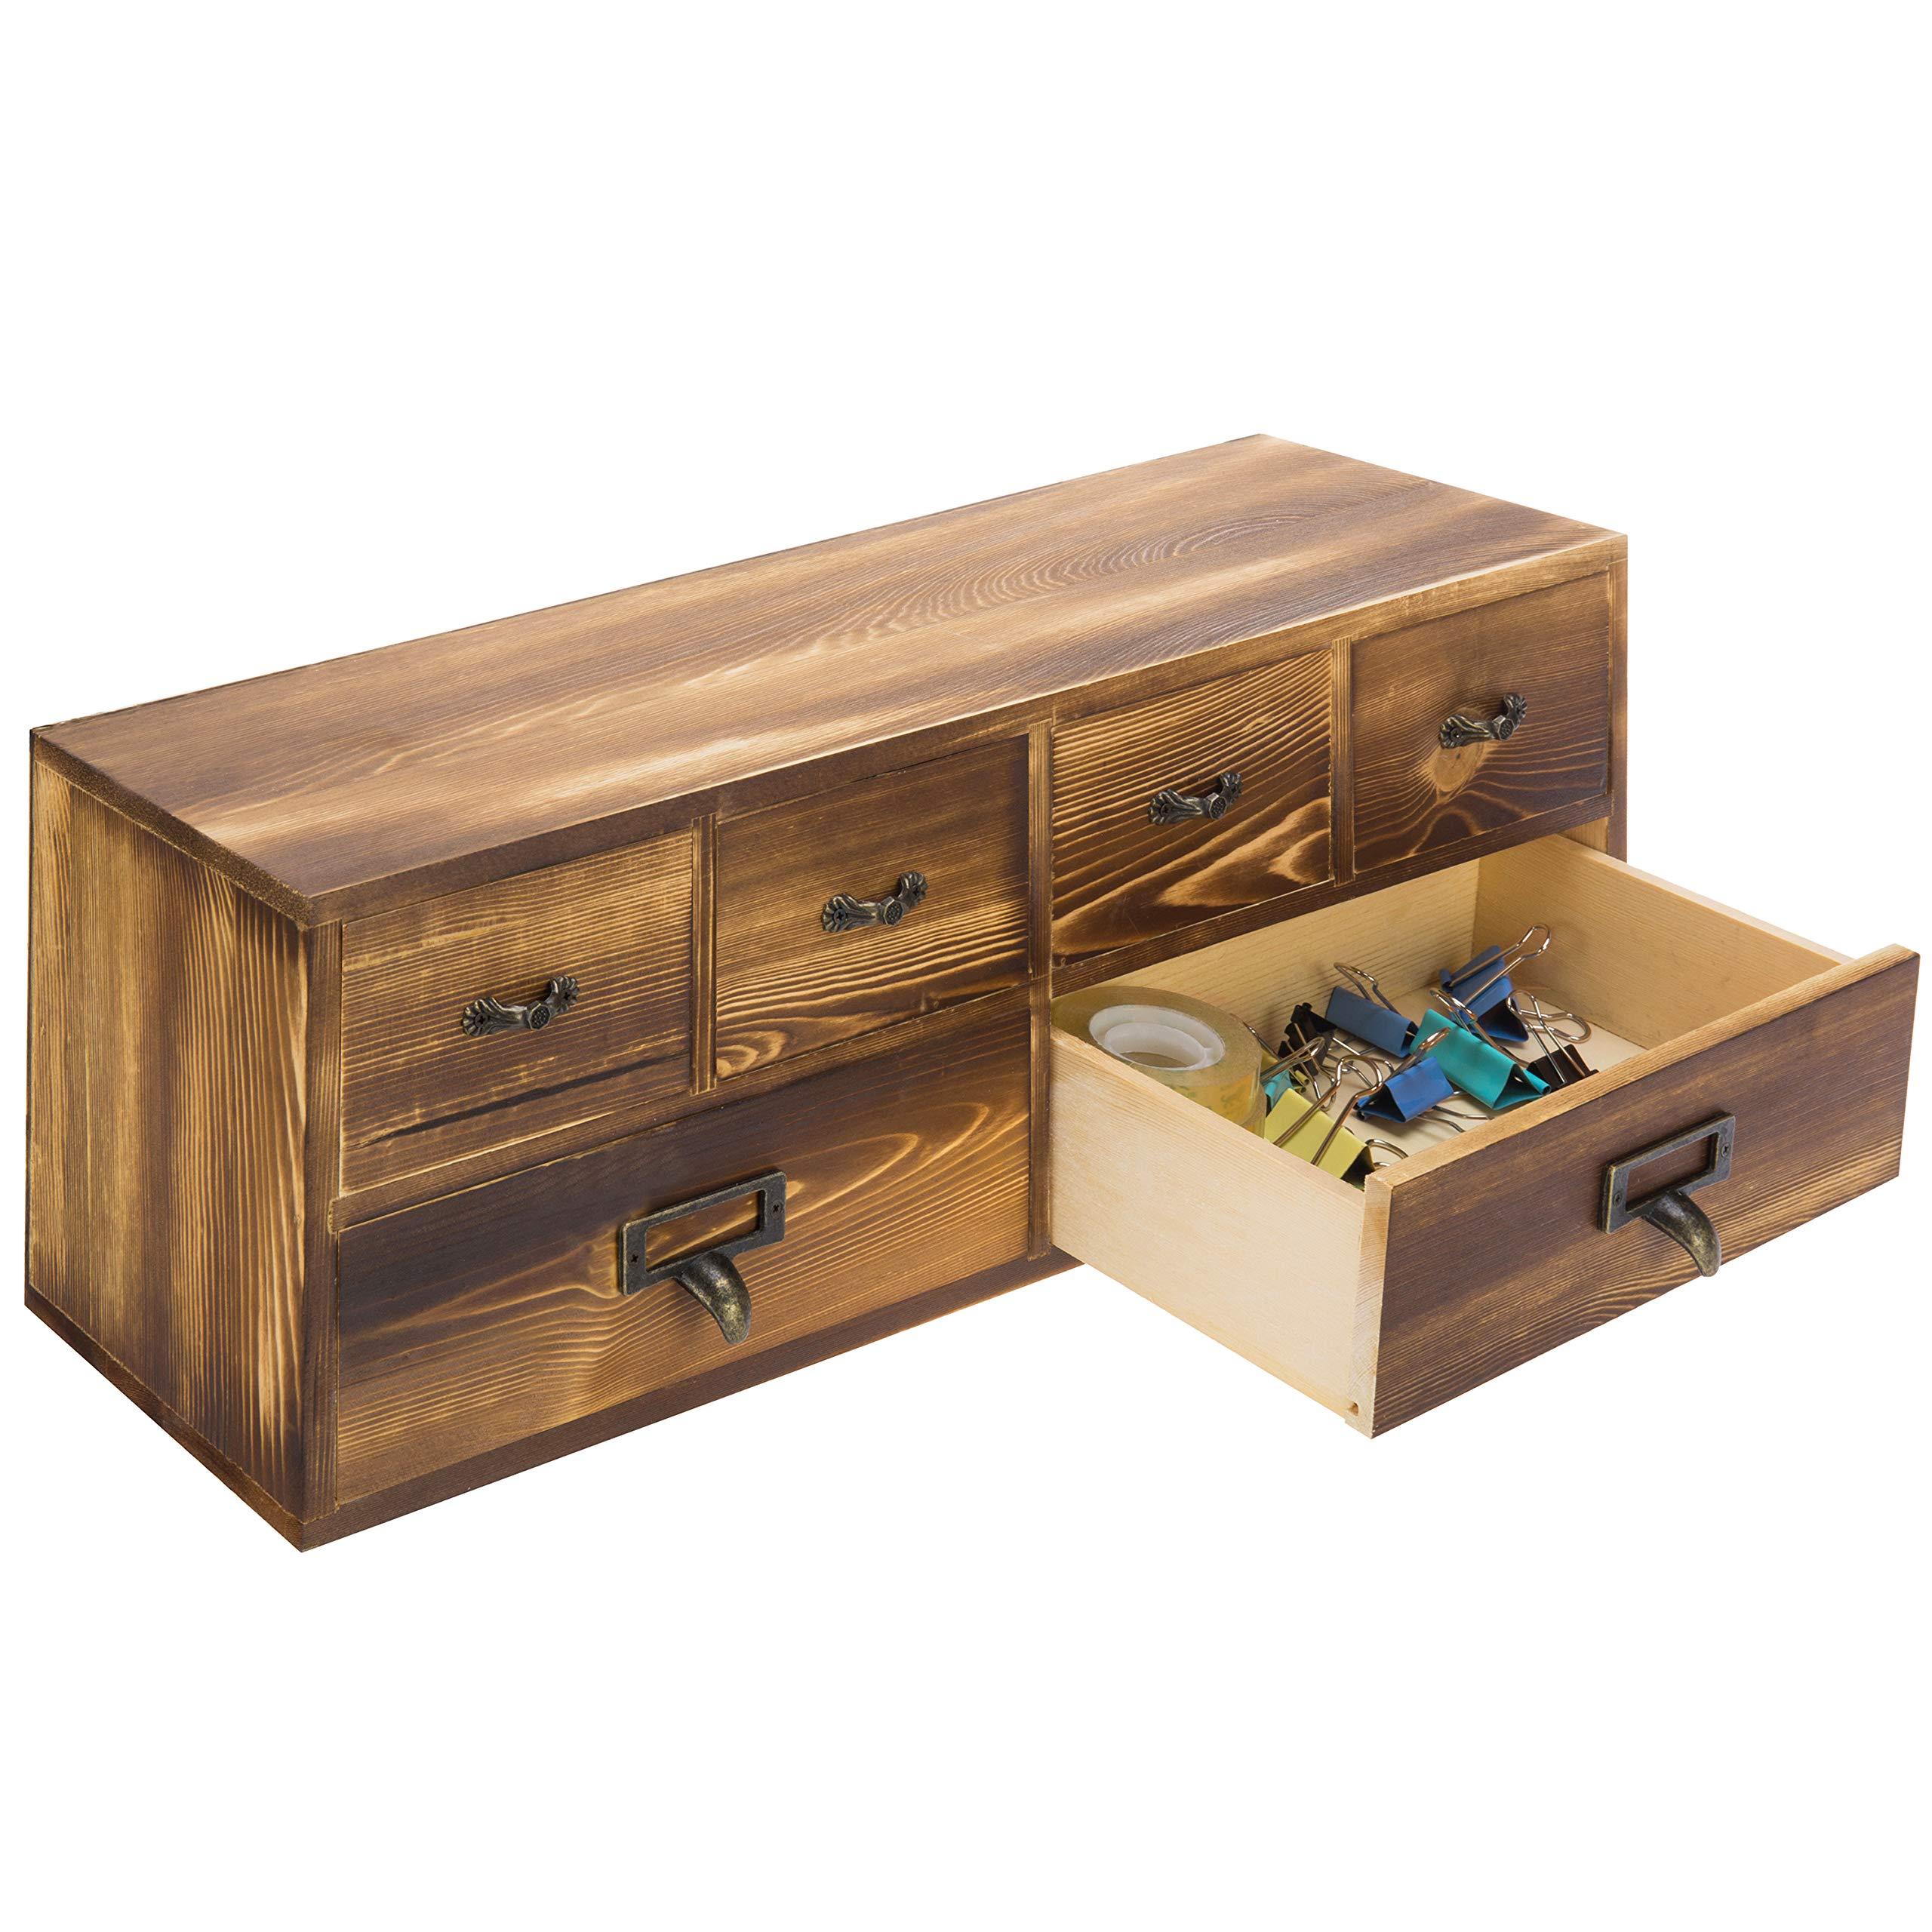 MyGift 19-Inch Burnt Wood Wall Mountable Storage Cabinet, Desktop Organizer Drawers